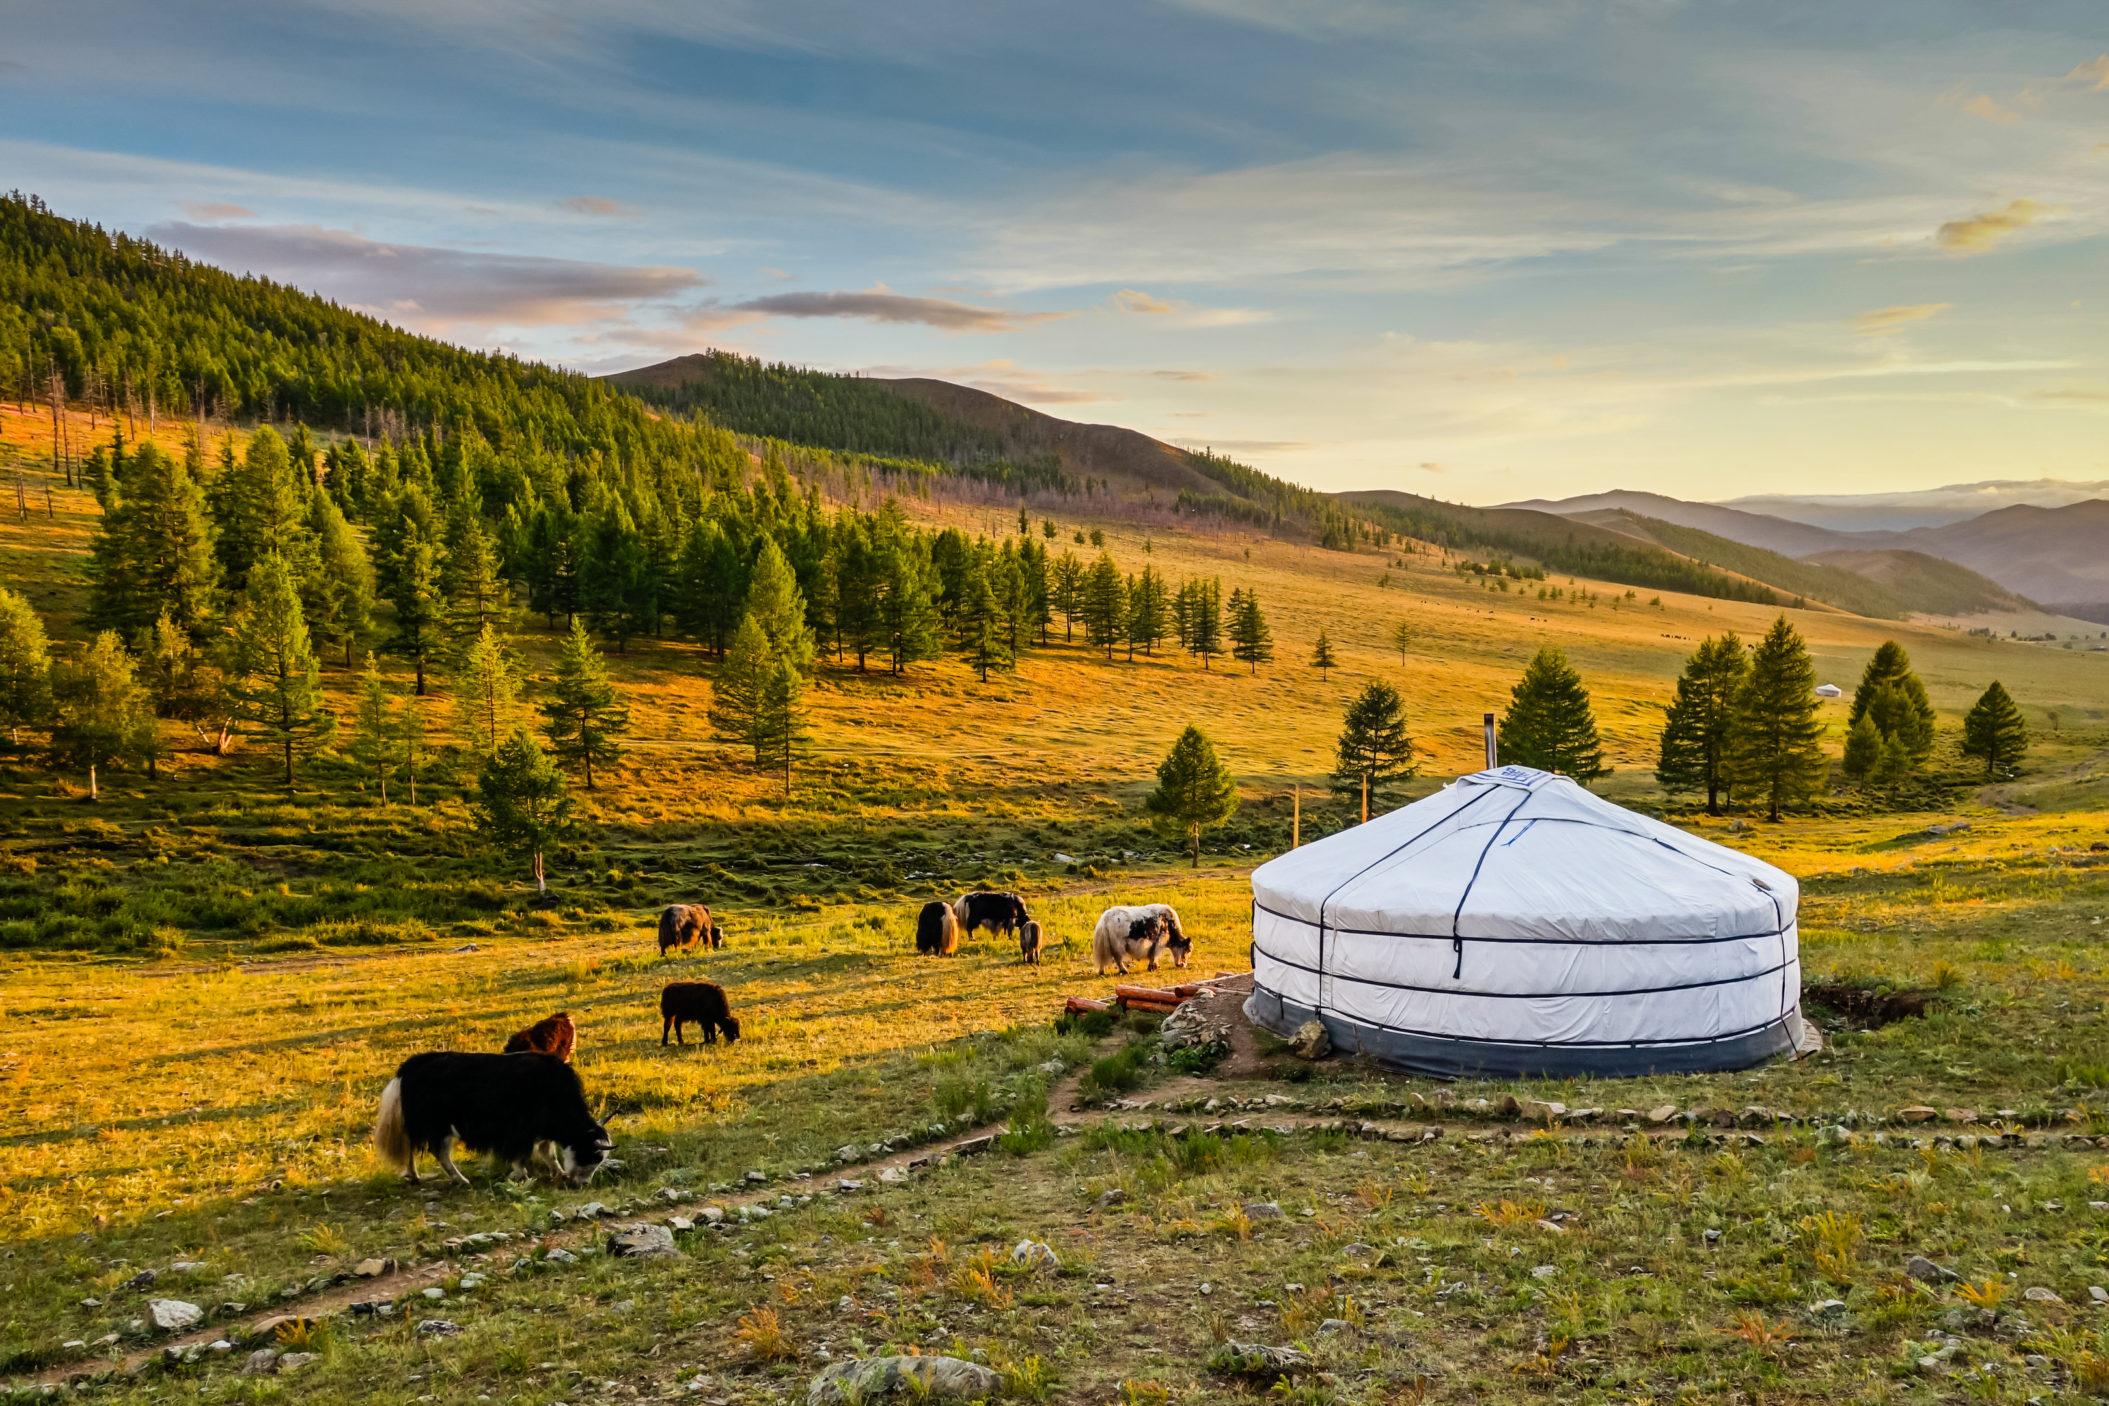 Mongolia [Shutterstock]